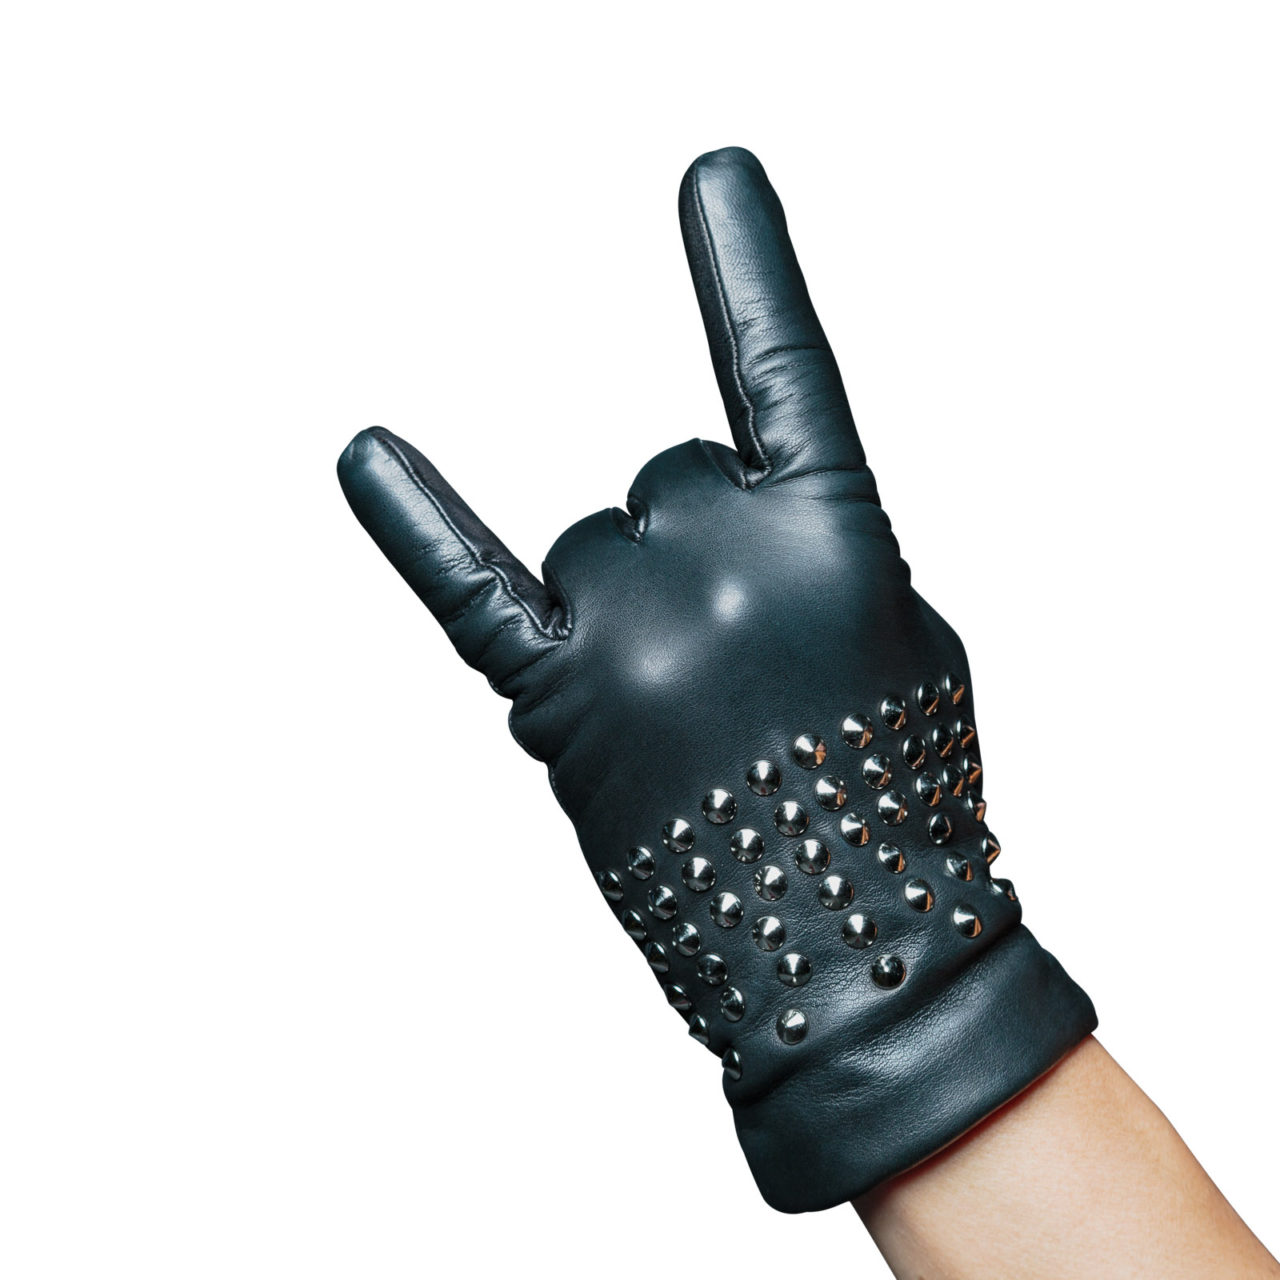 beau-gant-gloves-metal-studs-black-two